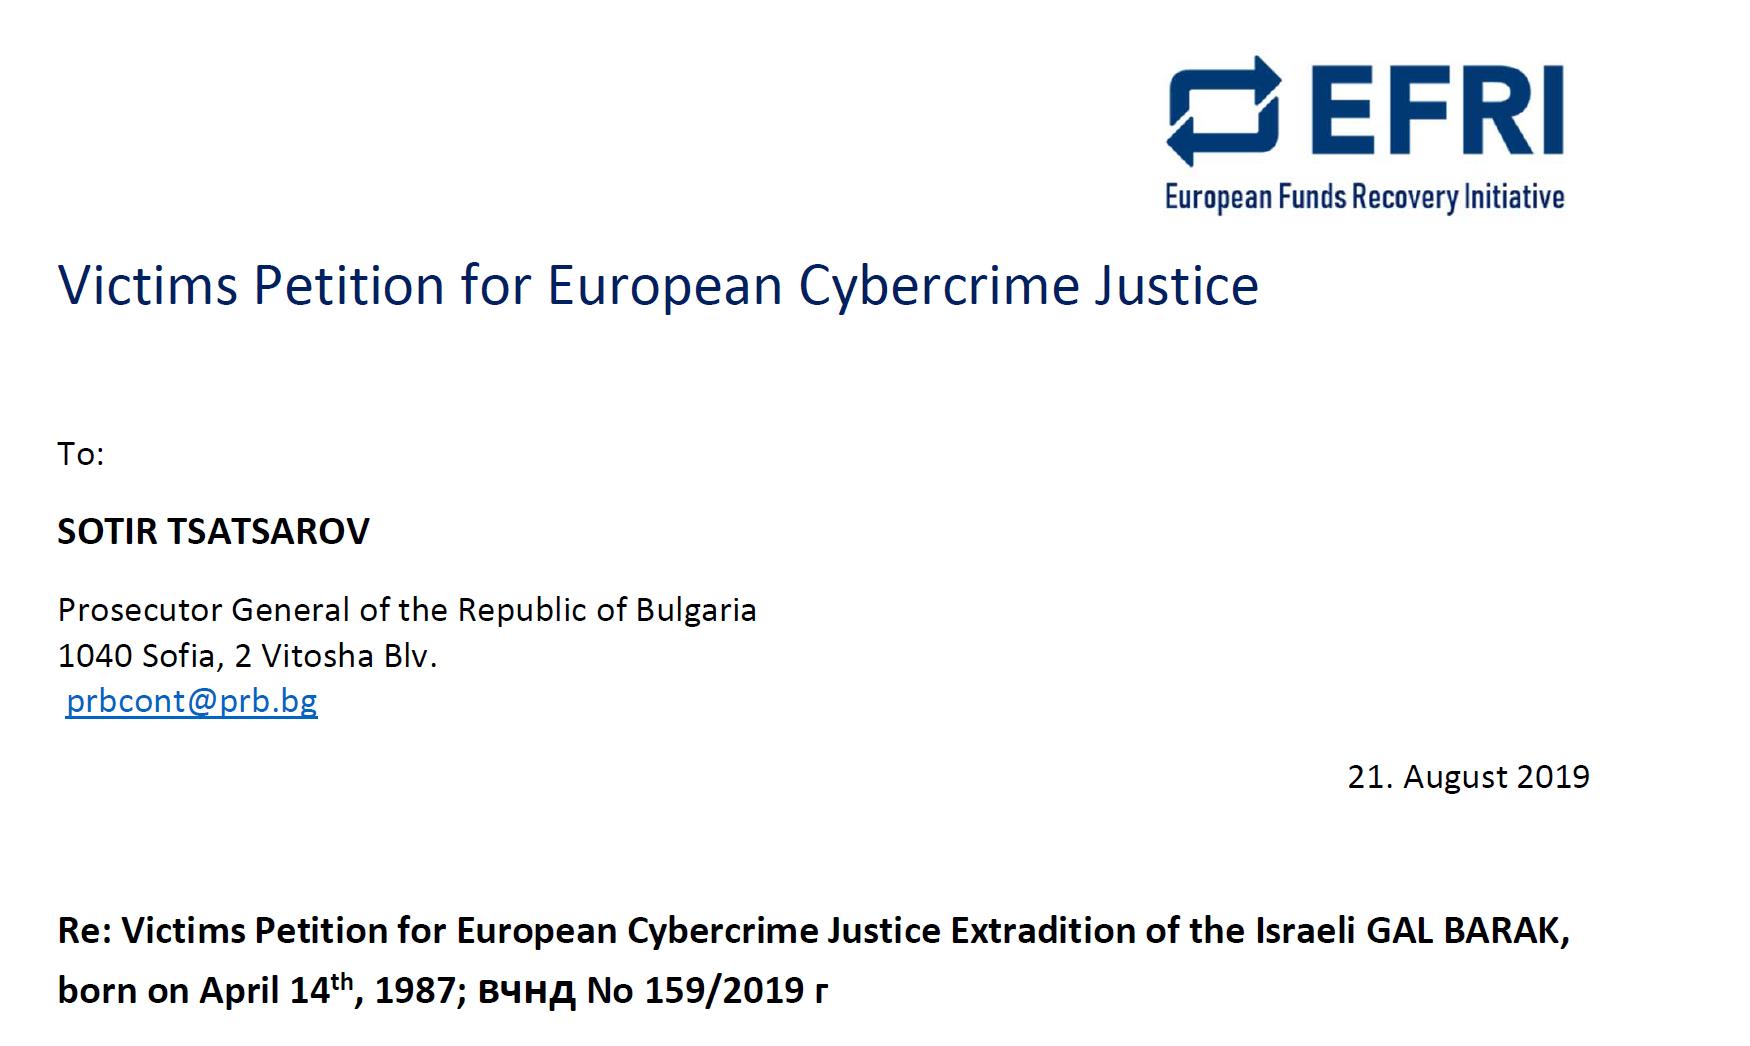 EFRI Petition for European Cybercrime Justice